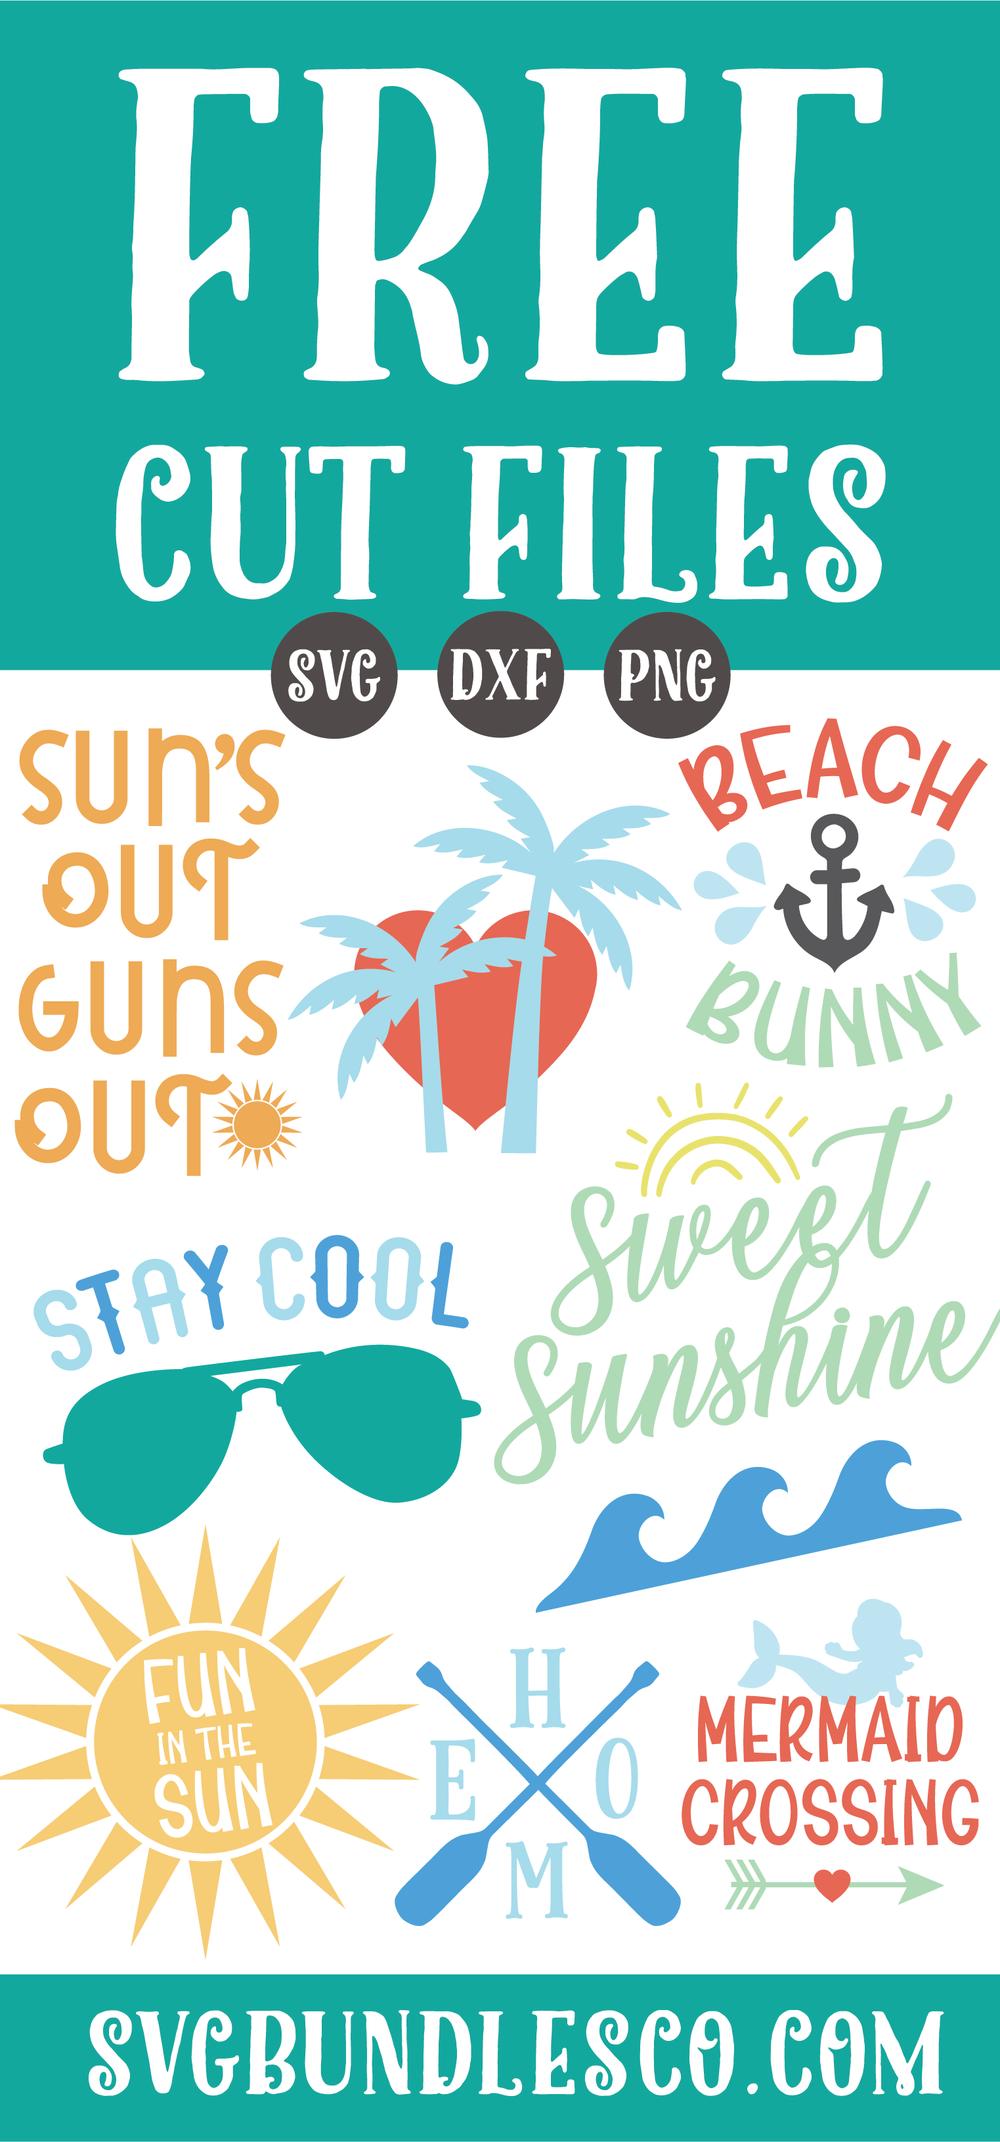 FREE SVG FILES! FREE summer svg files, summer svg, svg